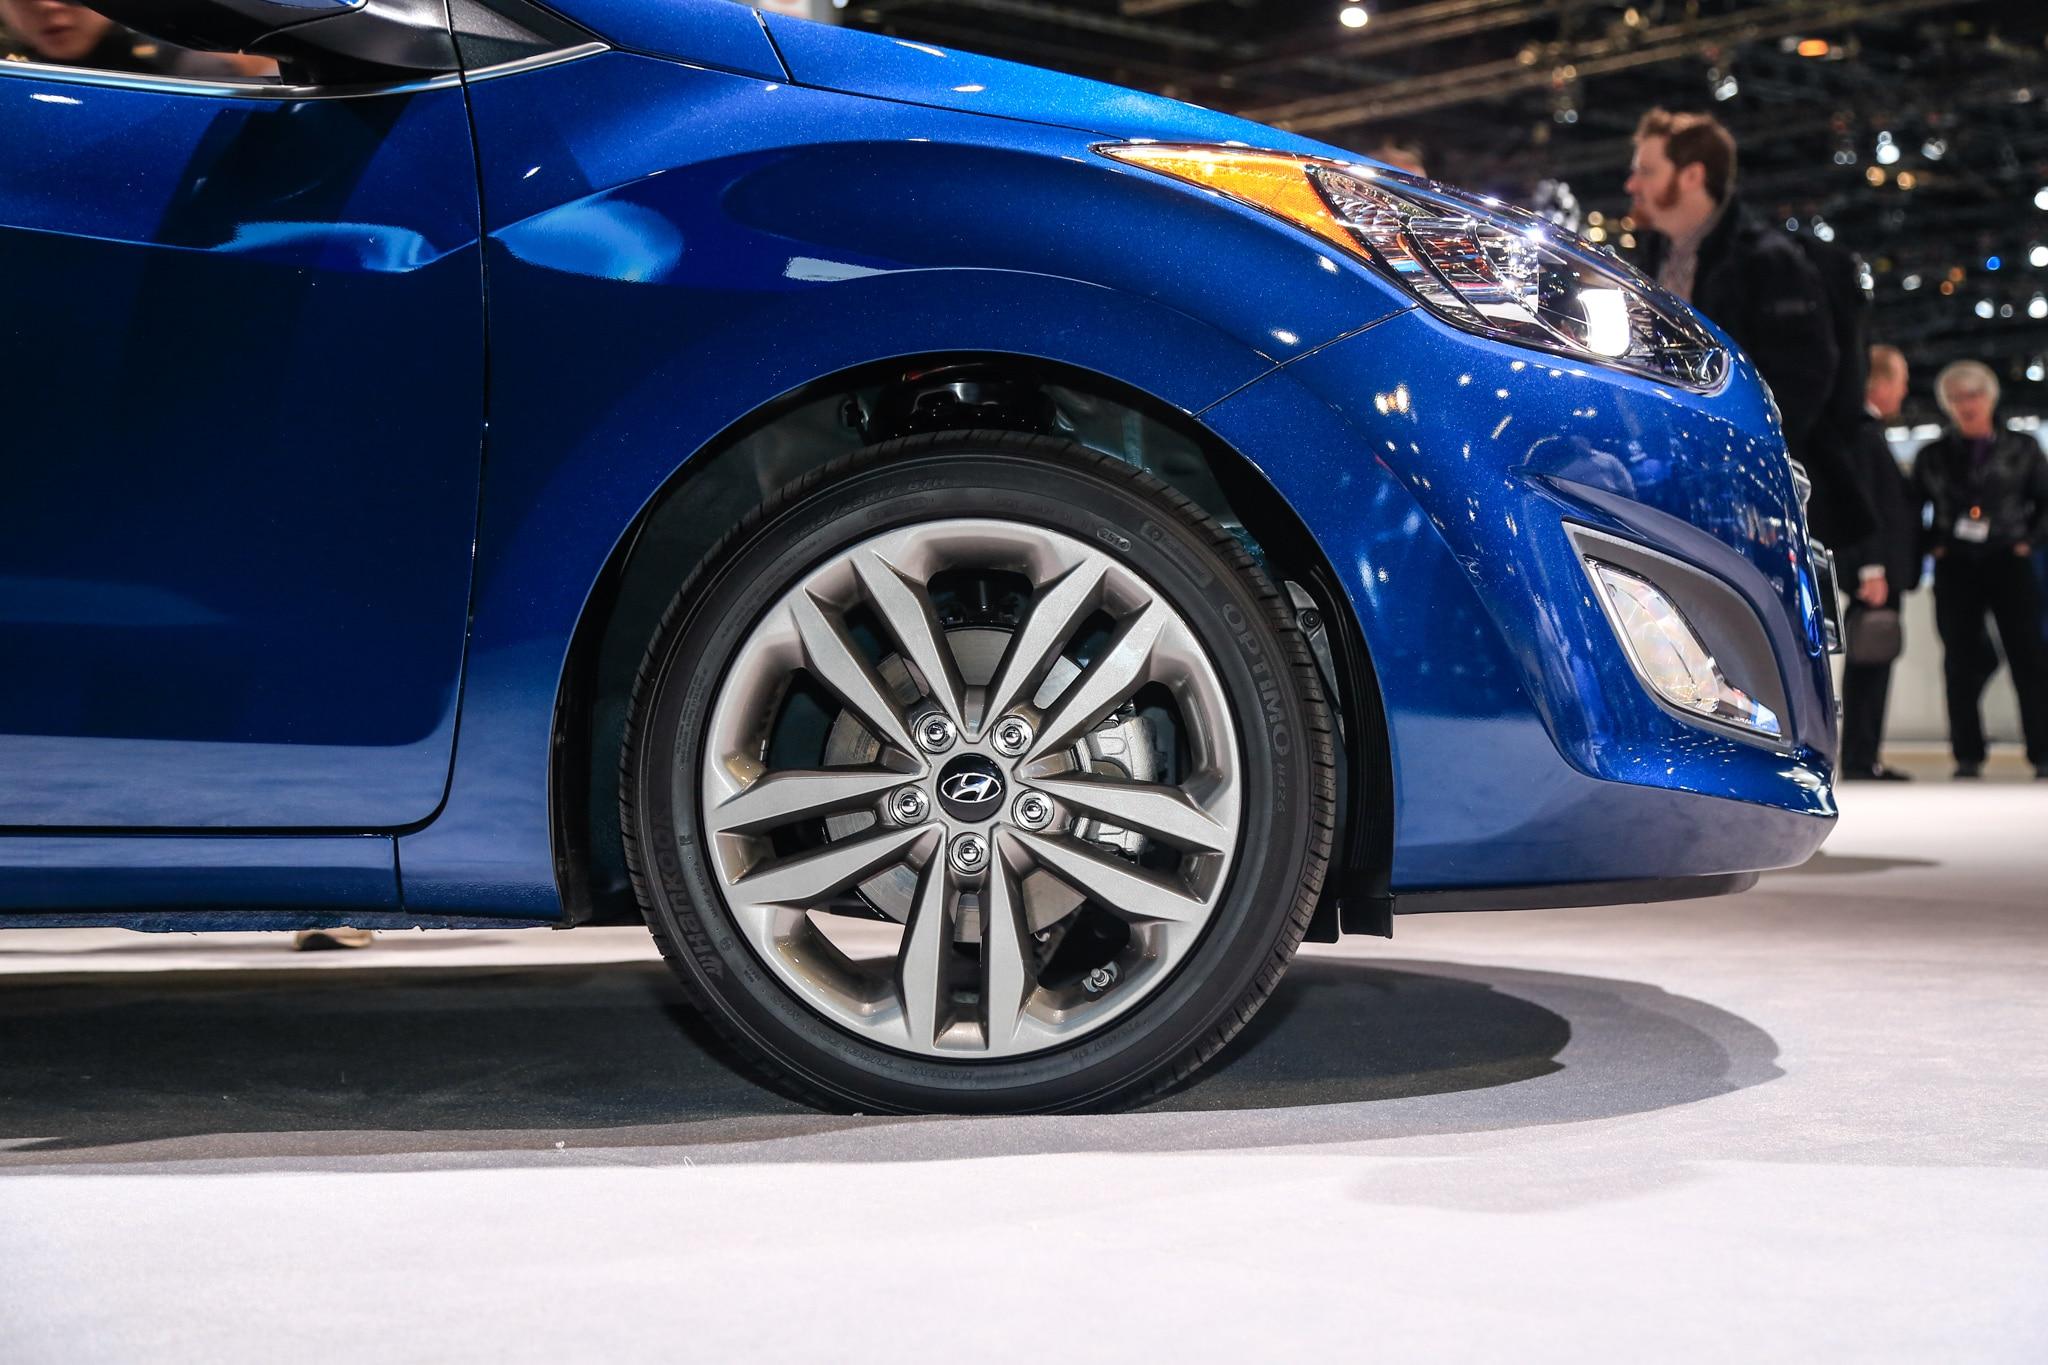 Hyundai, Kia Plan to Launch Autonomous Cars by 2020